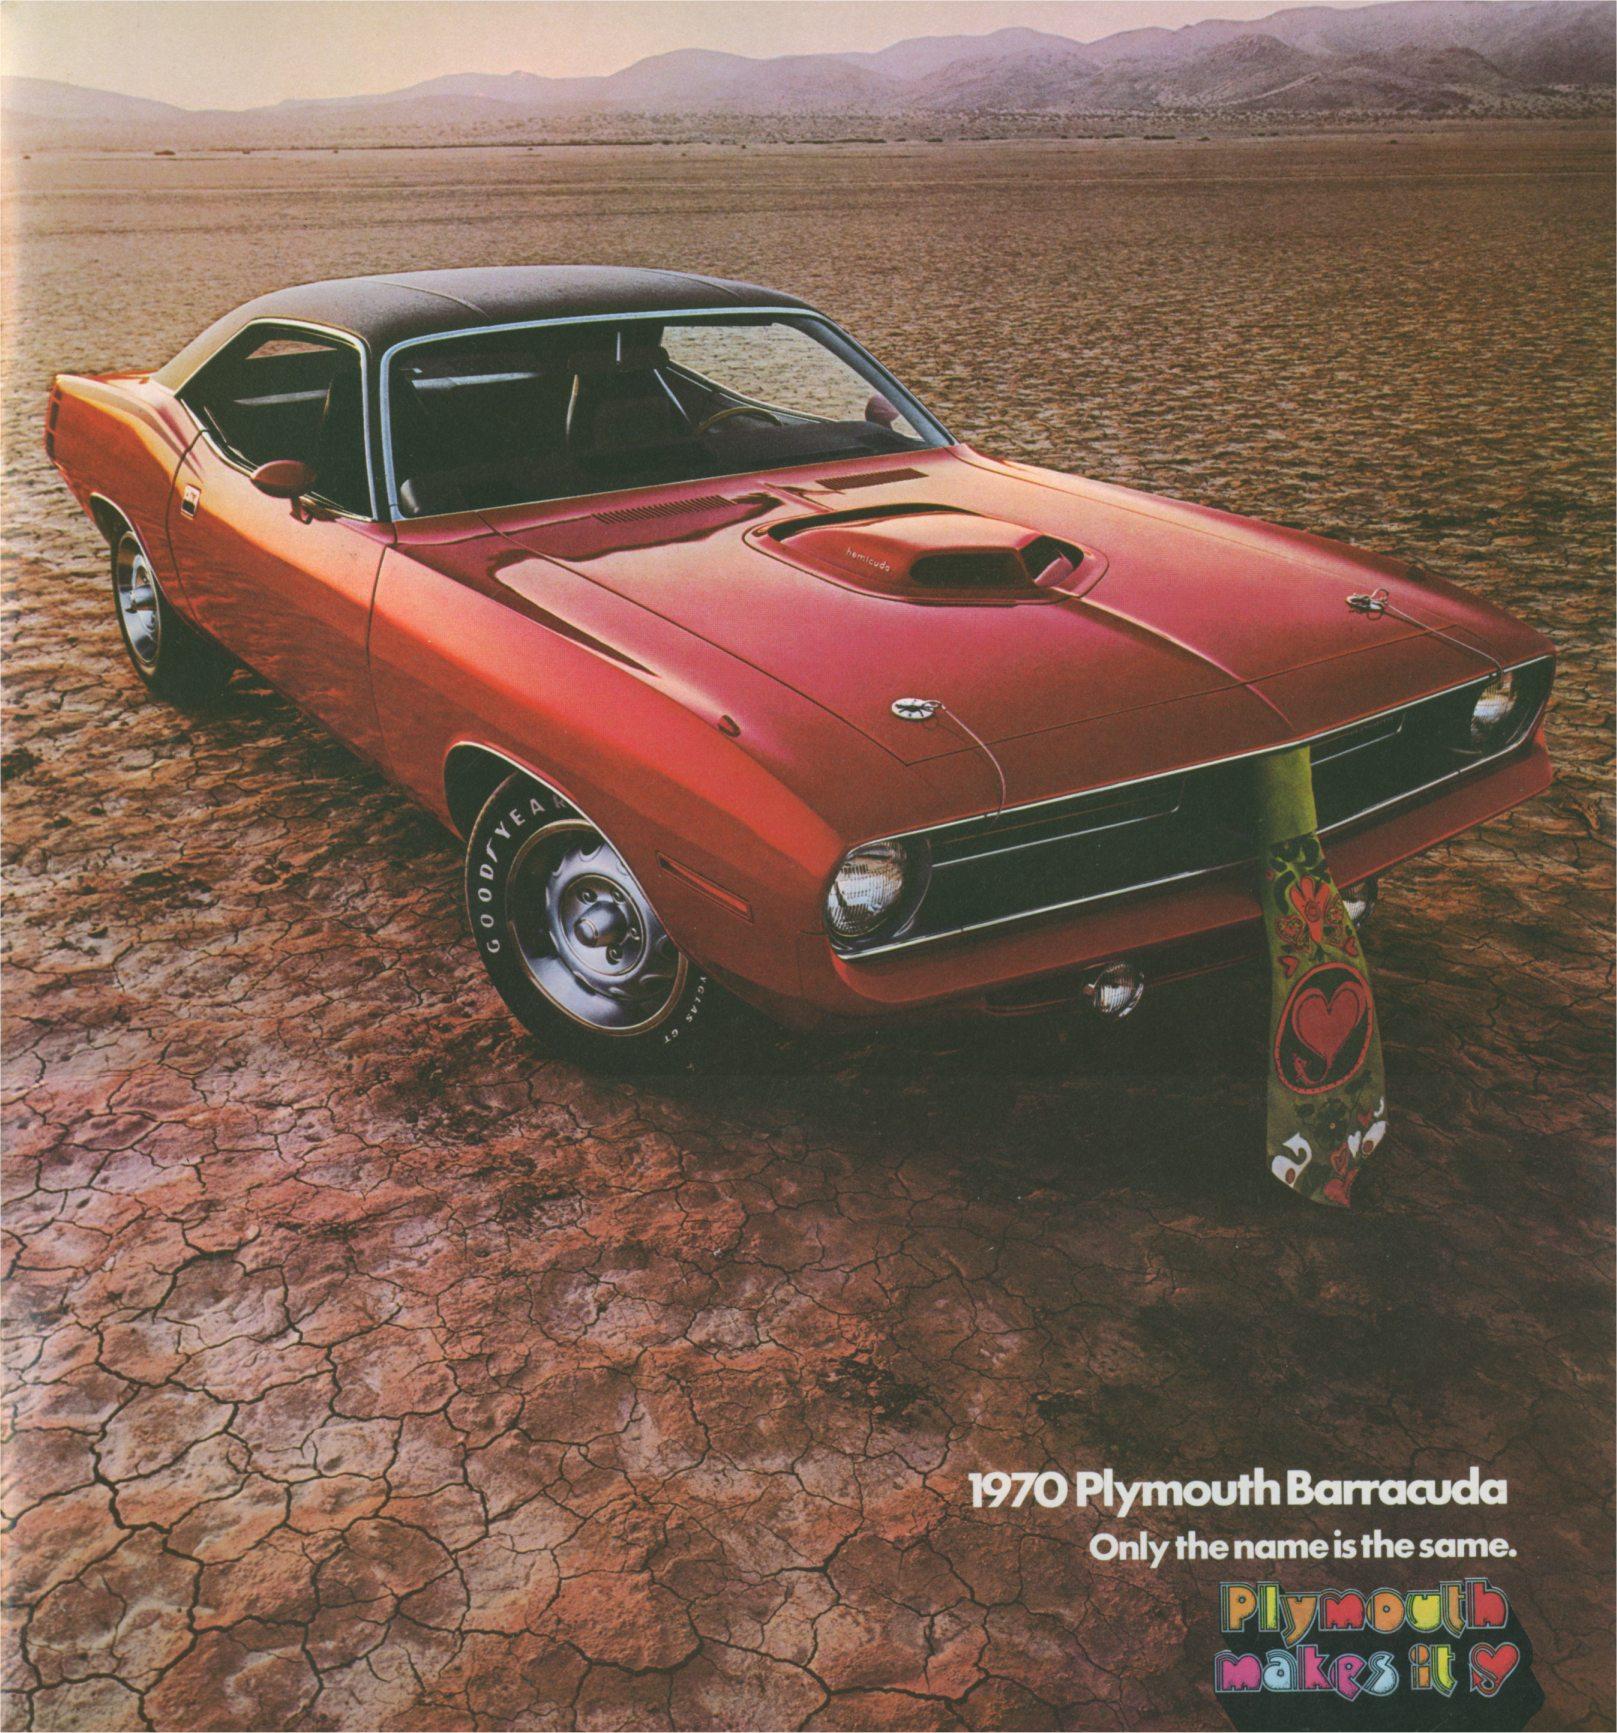 http://www.stockmopar.com/_images/brochures/1970-plymouth-barracuda-brochure/original/1970-plymouth-barracuda-brochure-1.jpg